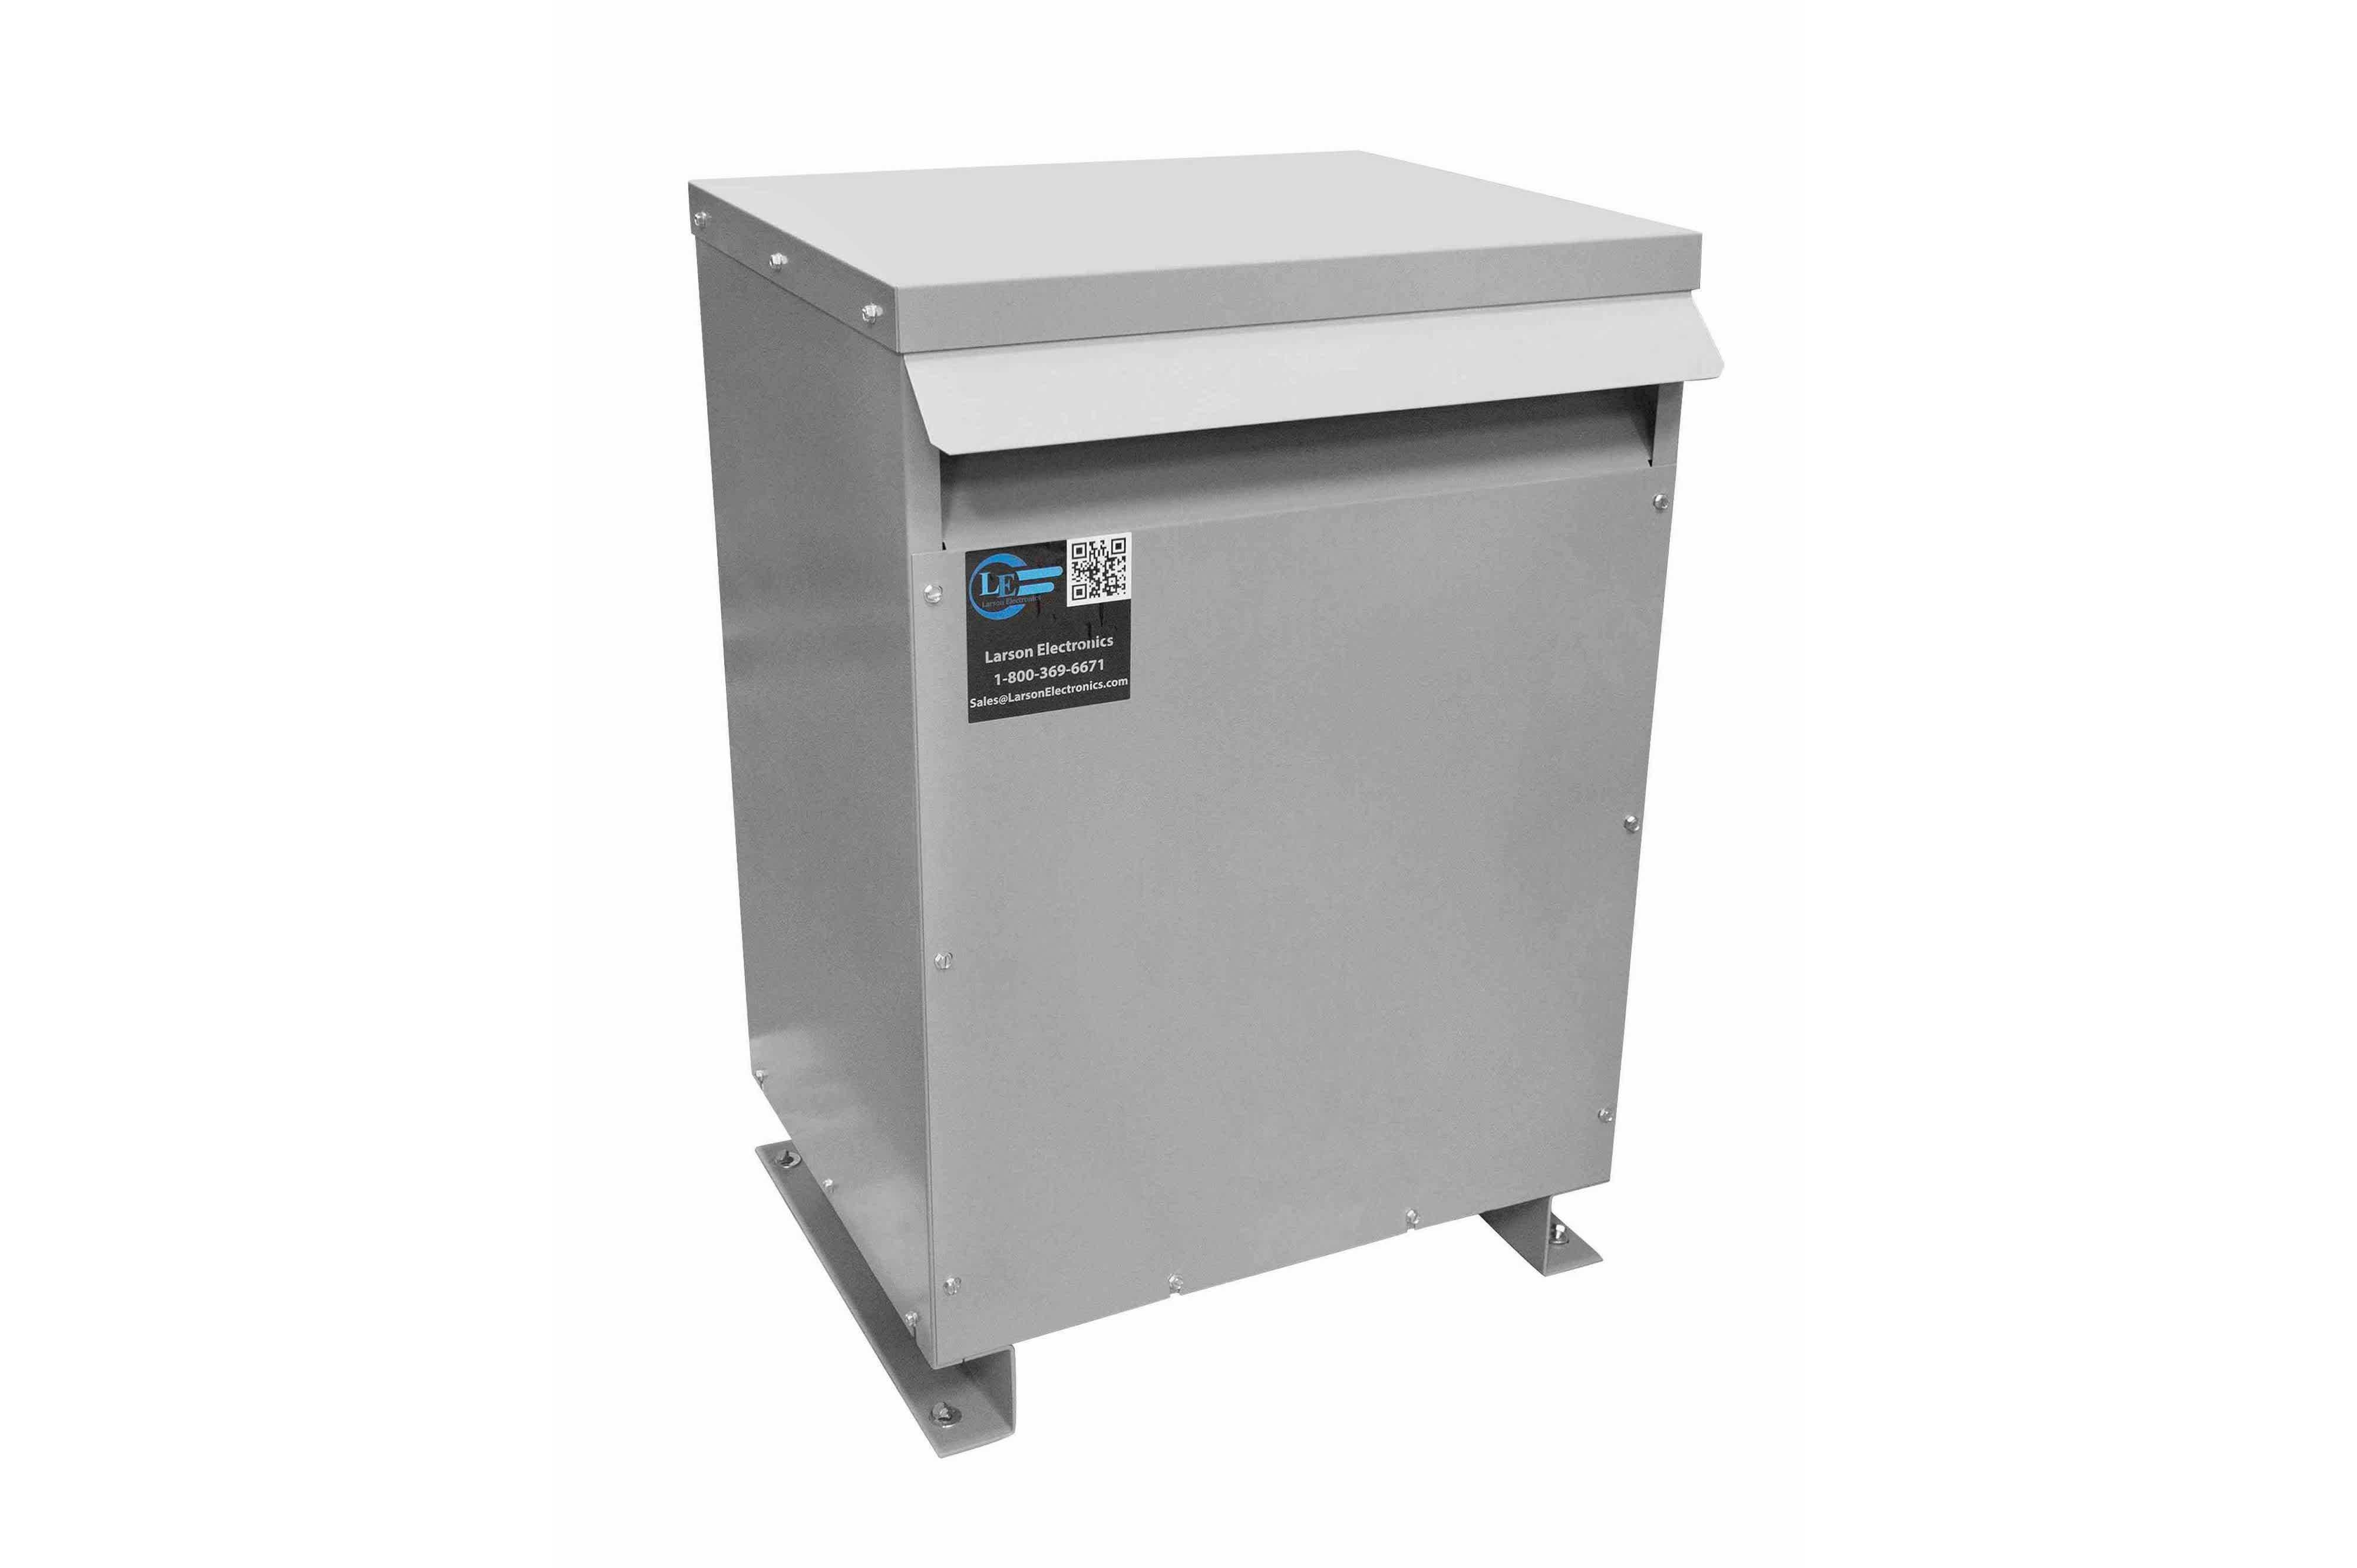 110 kVA 3PH Isolation Transformer, 575V Wye Primary, 480V Delta Secondary, N3R, Ventilated, 60 Hz